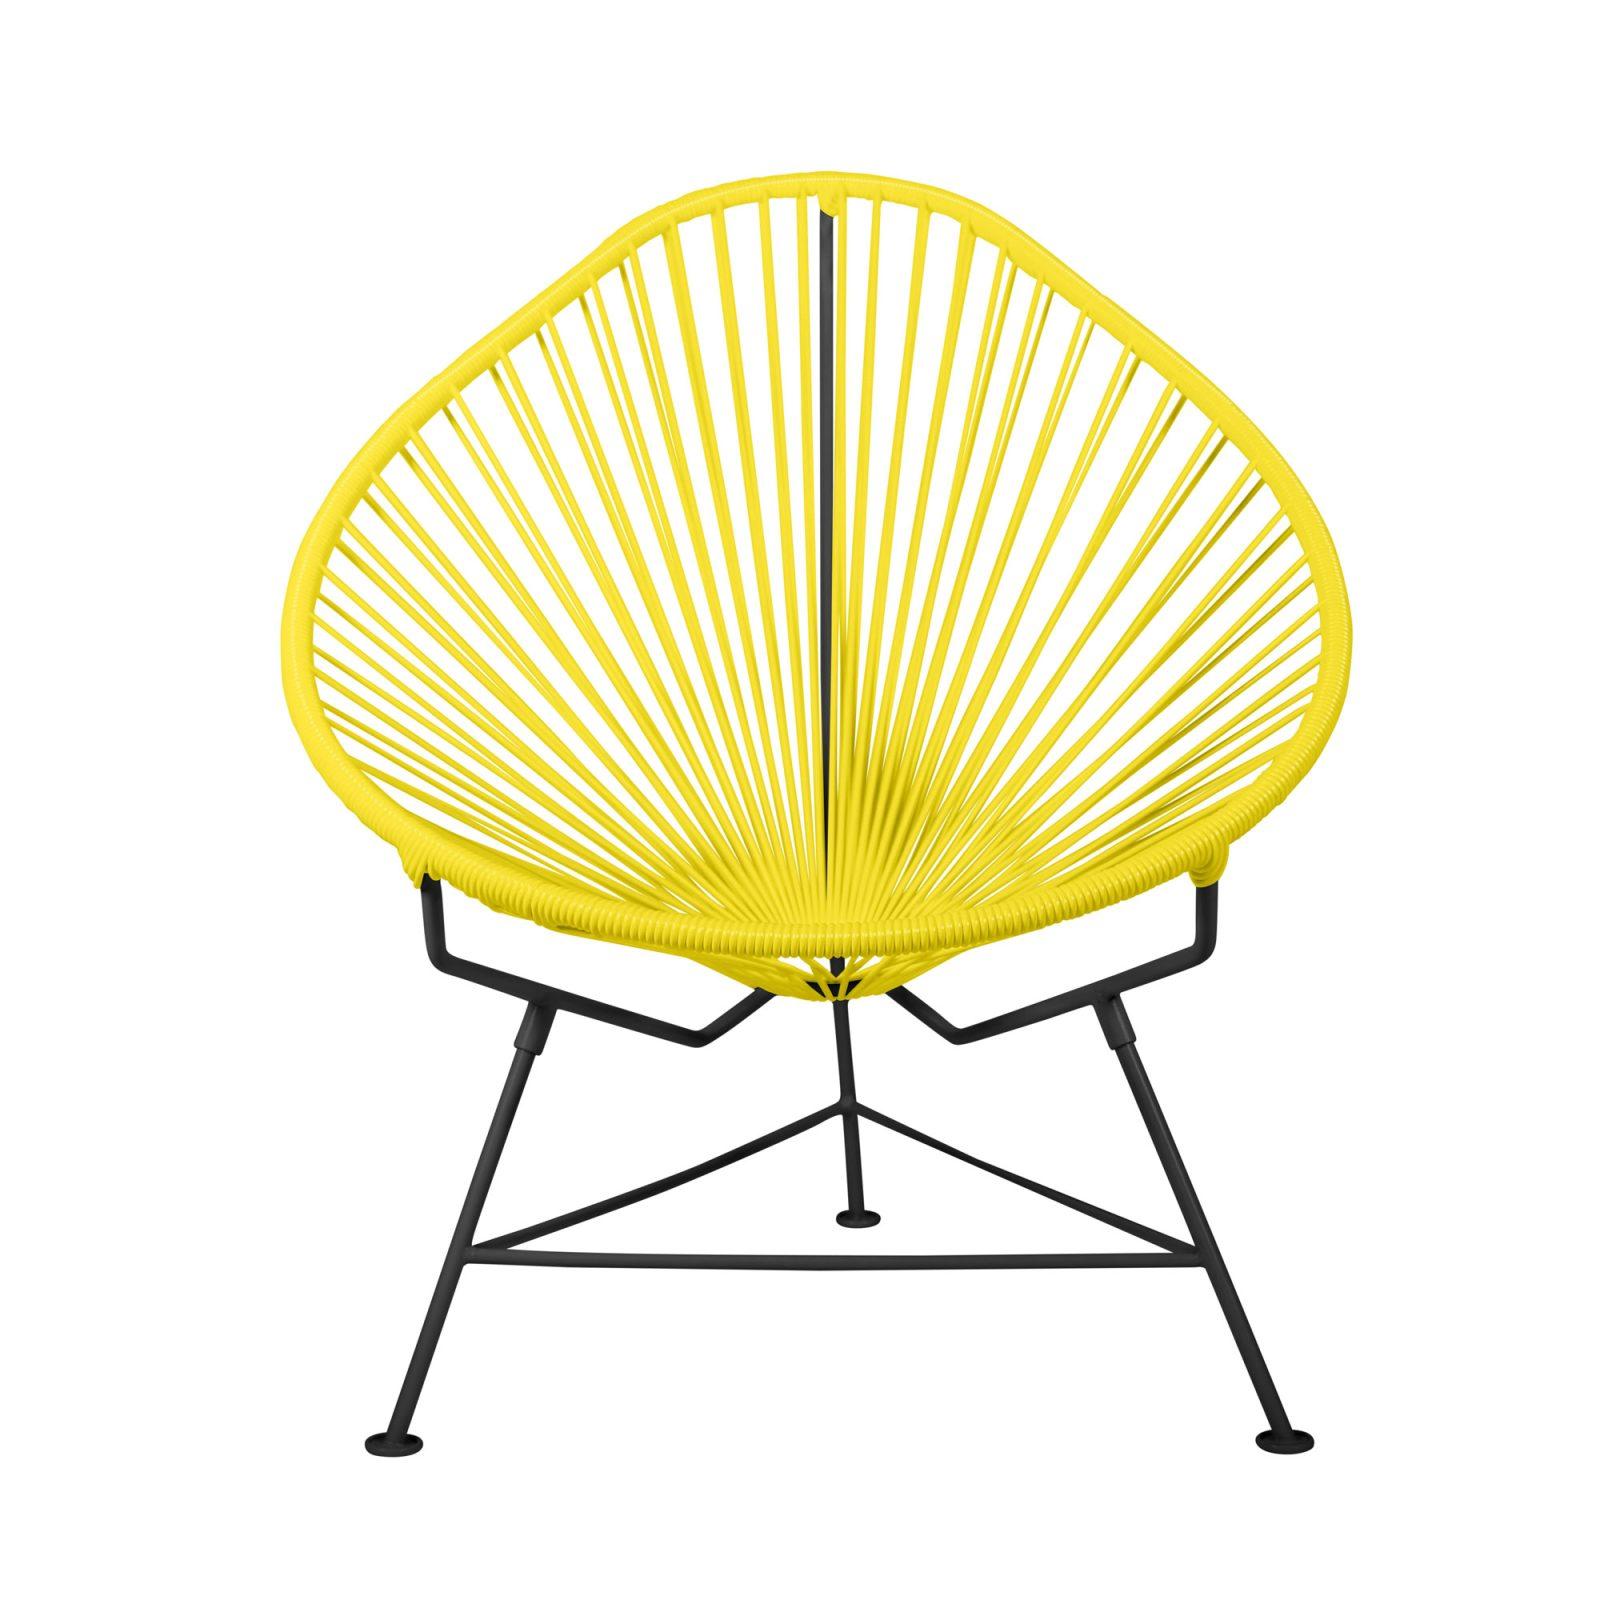 acapulco-chair-black-frame-2